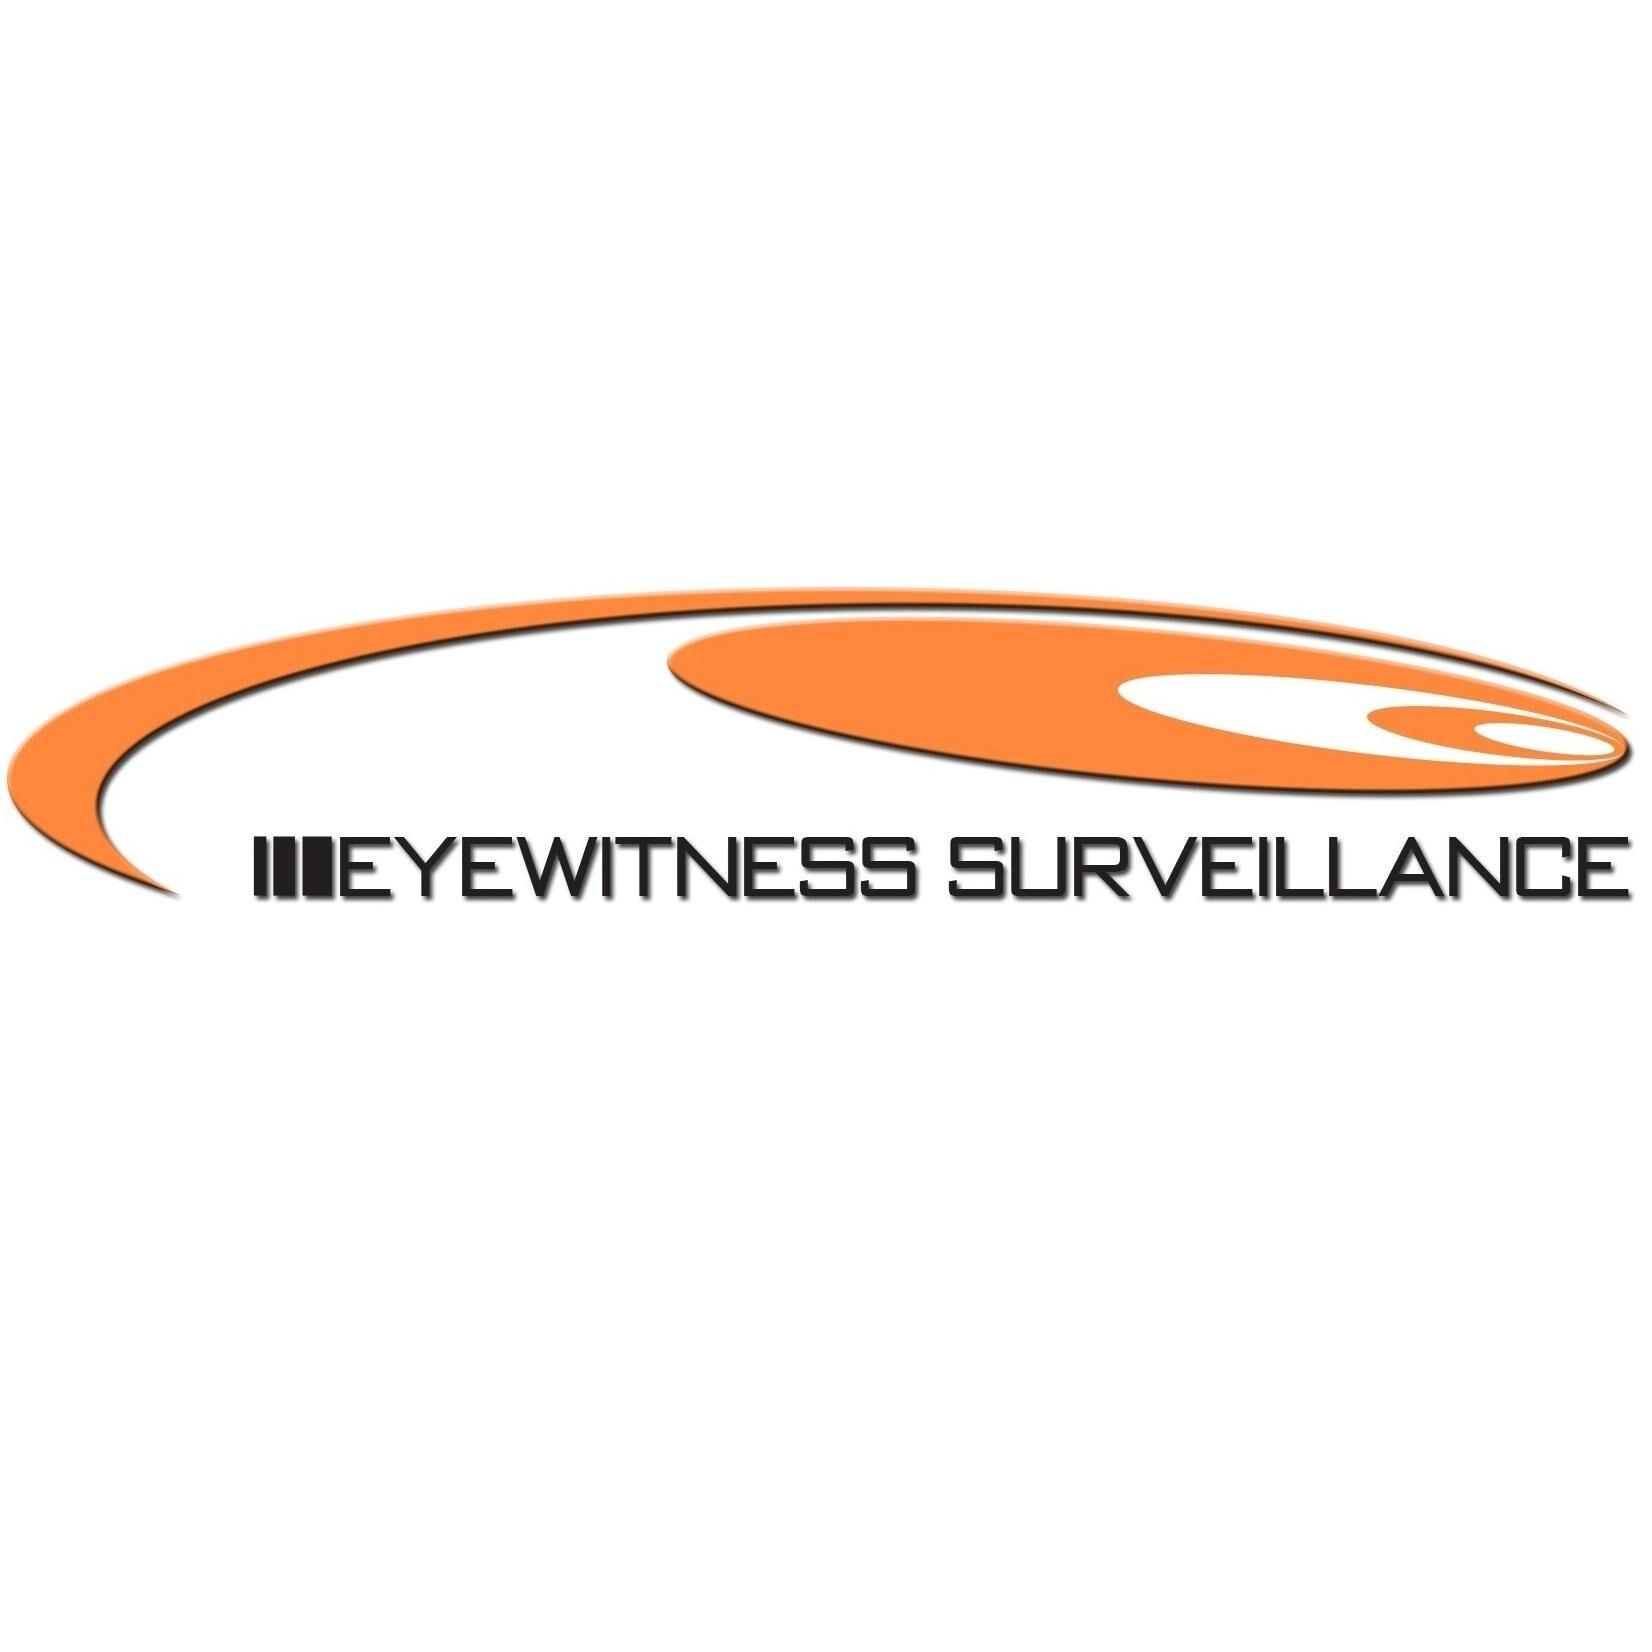 Eyewitness Surveillance